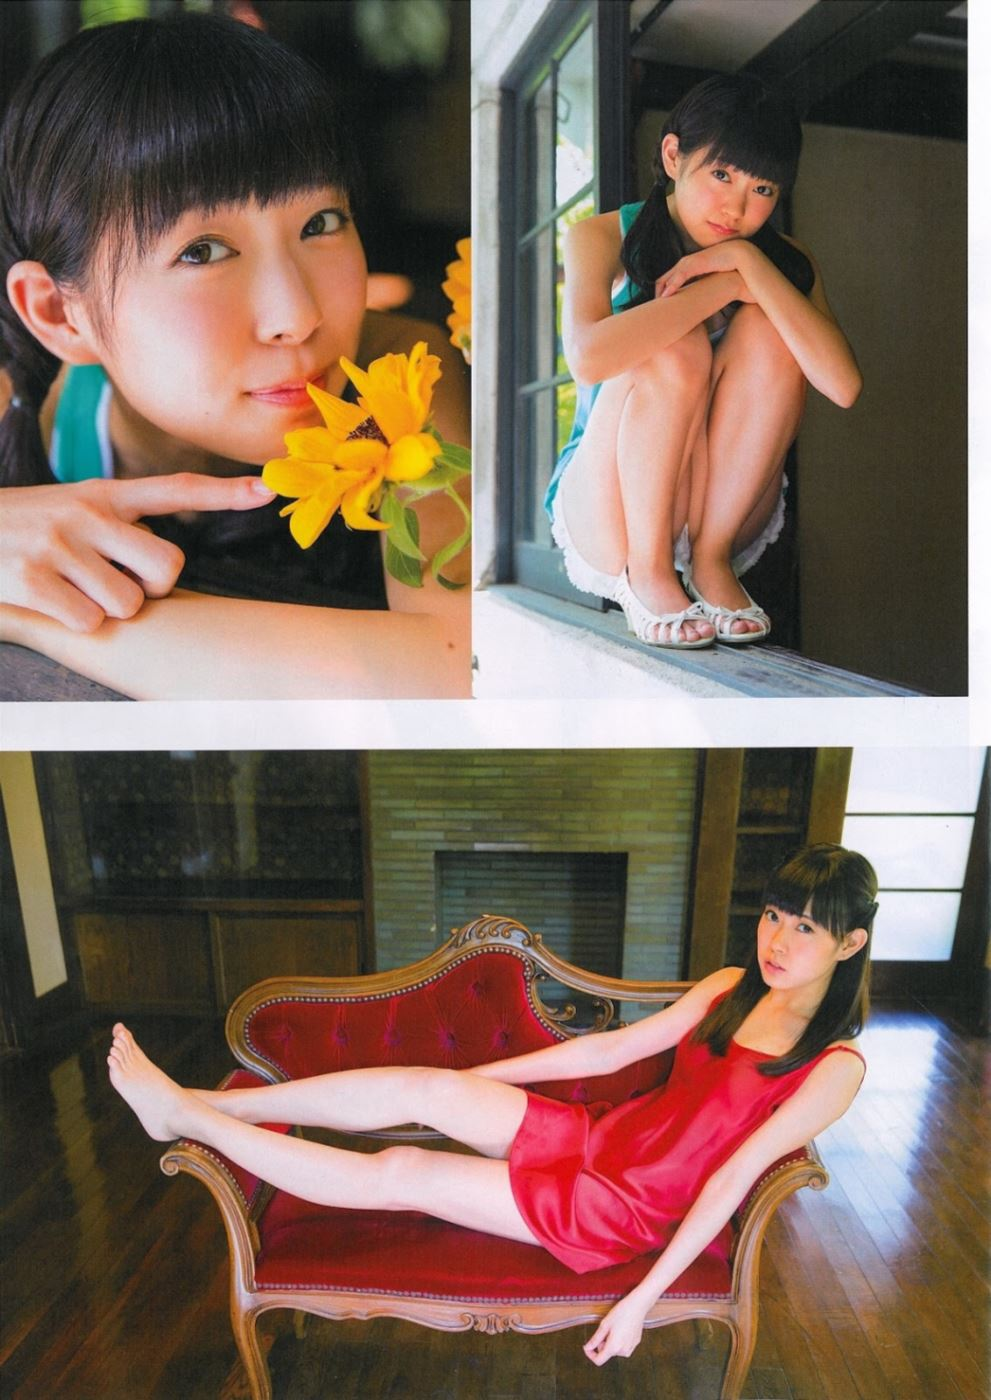 渡辺美優紀 エロ画像 17